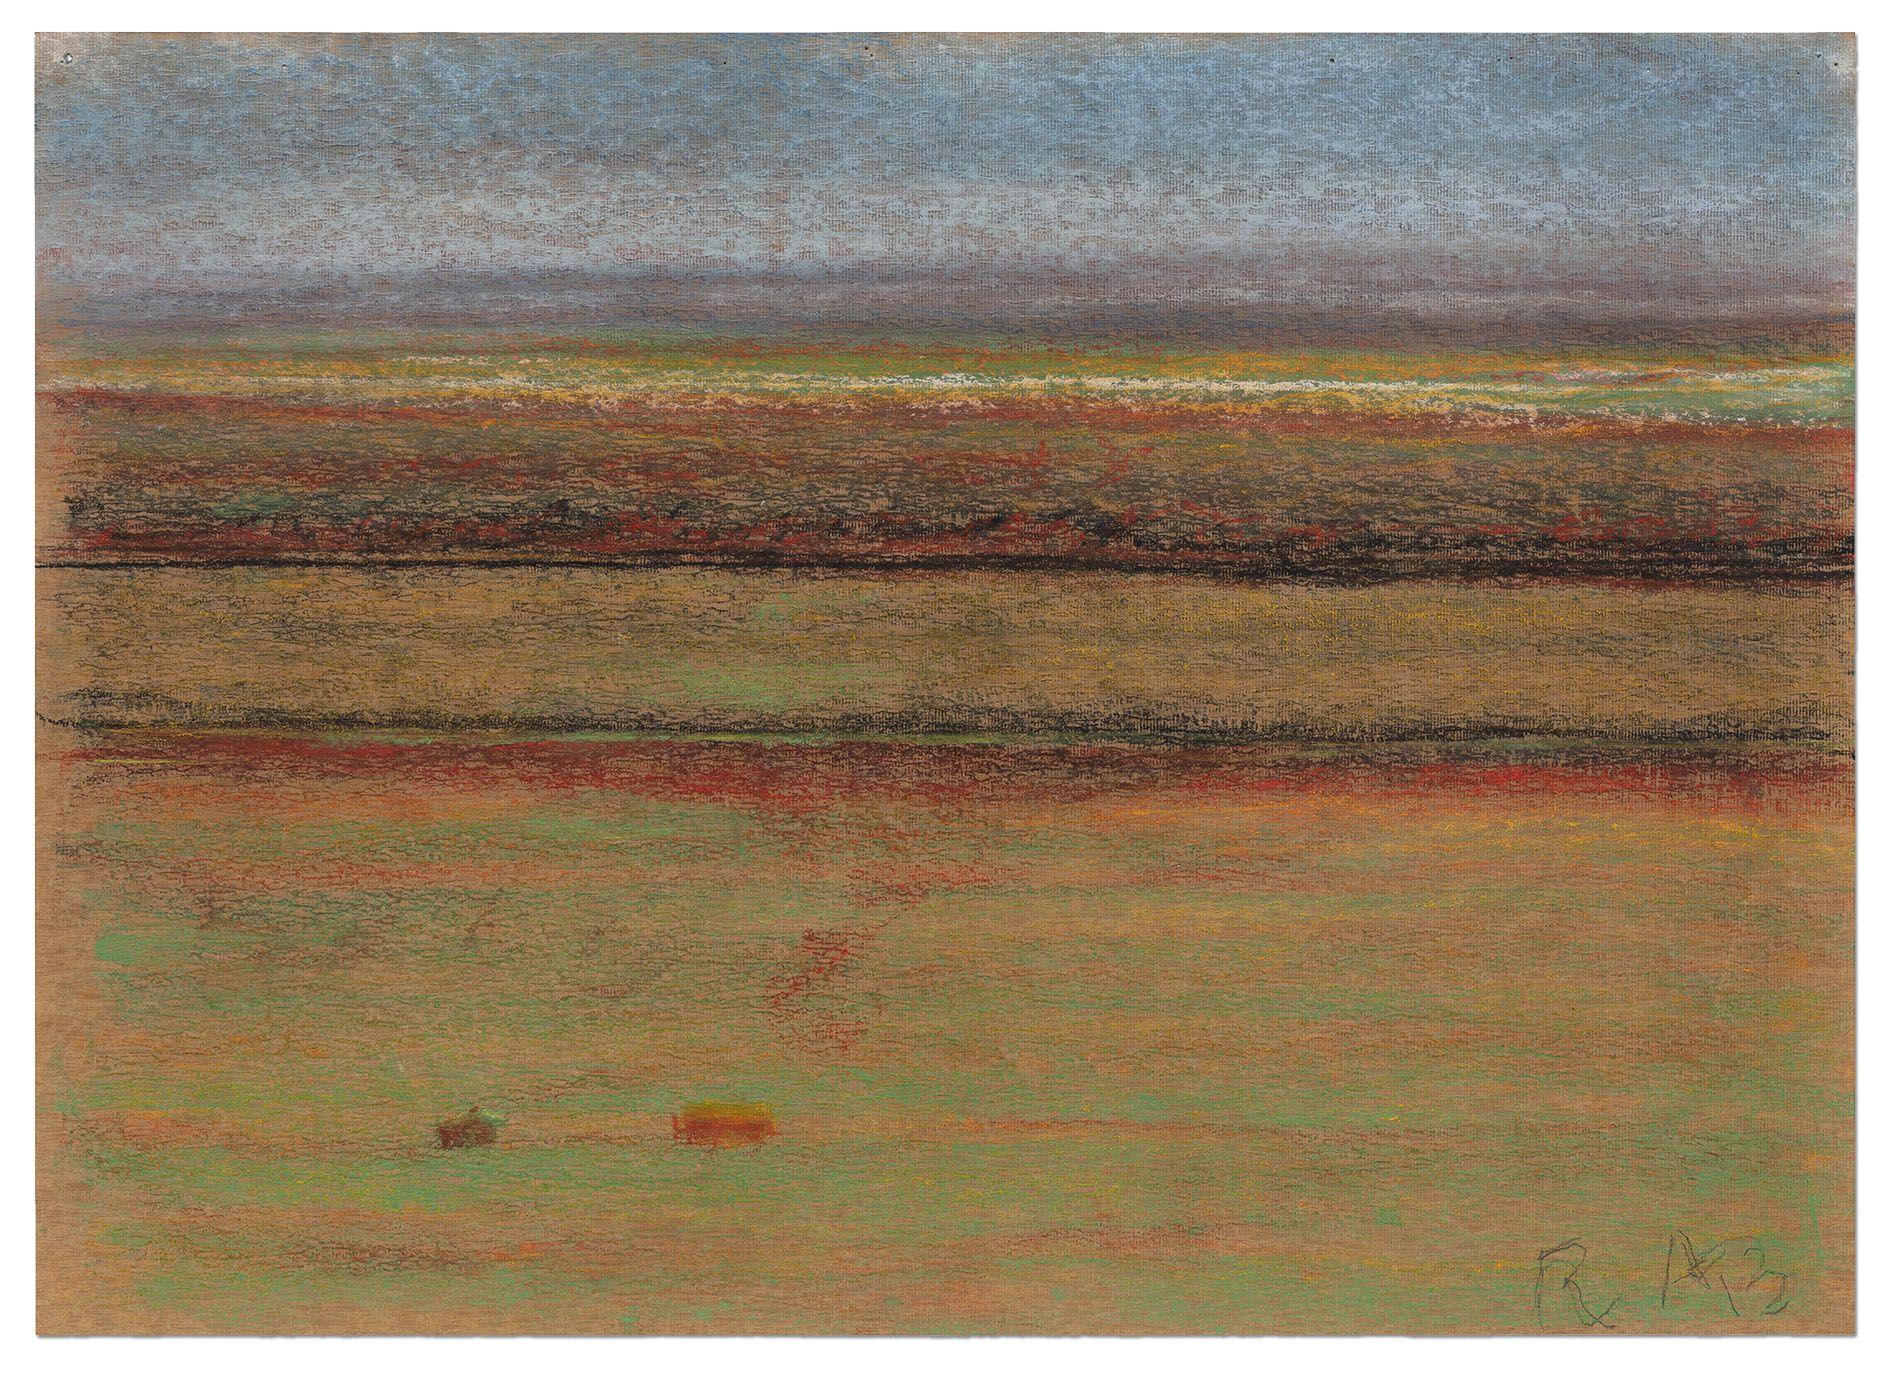 Richard Artschwager – New Mexico – Berlin